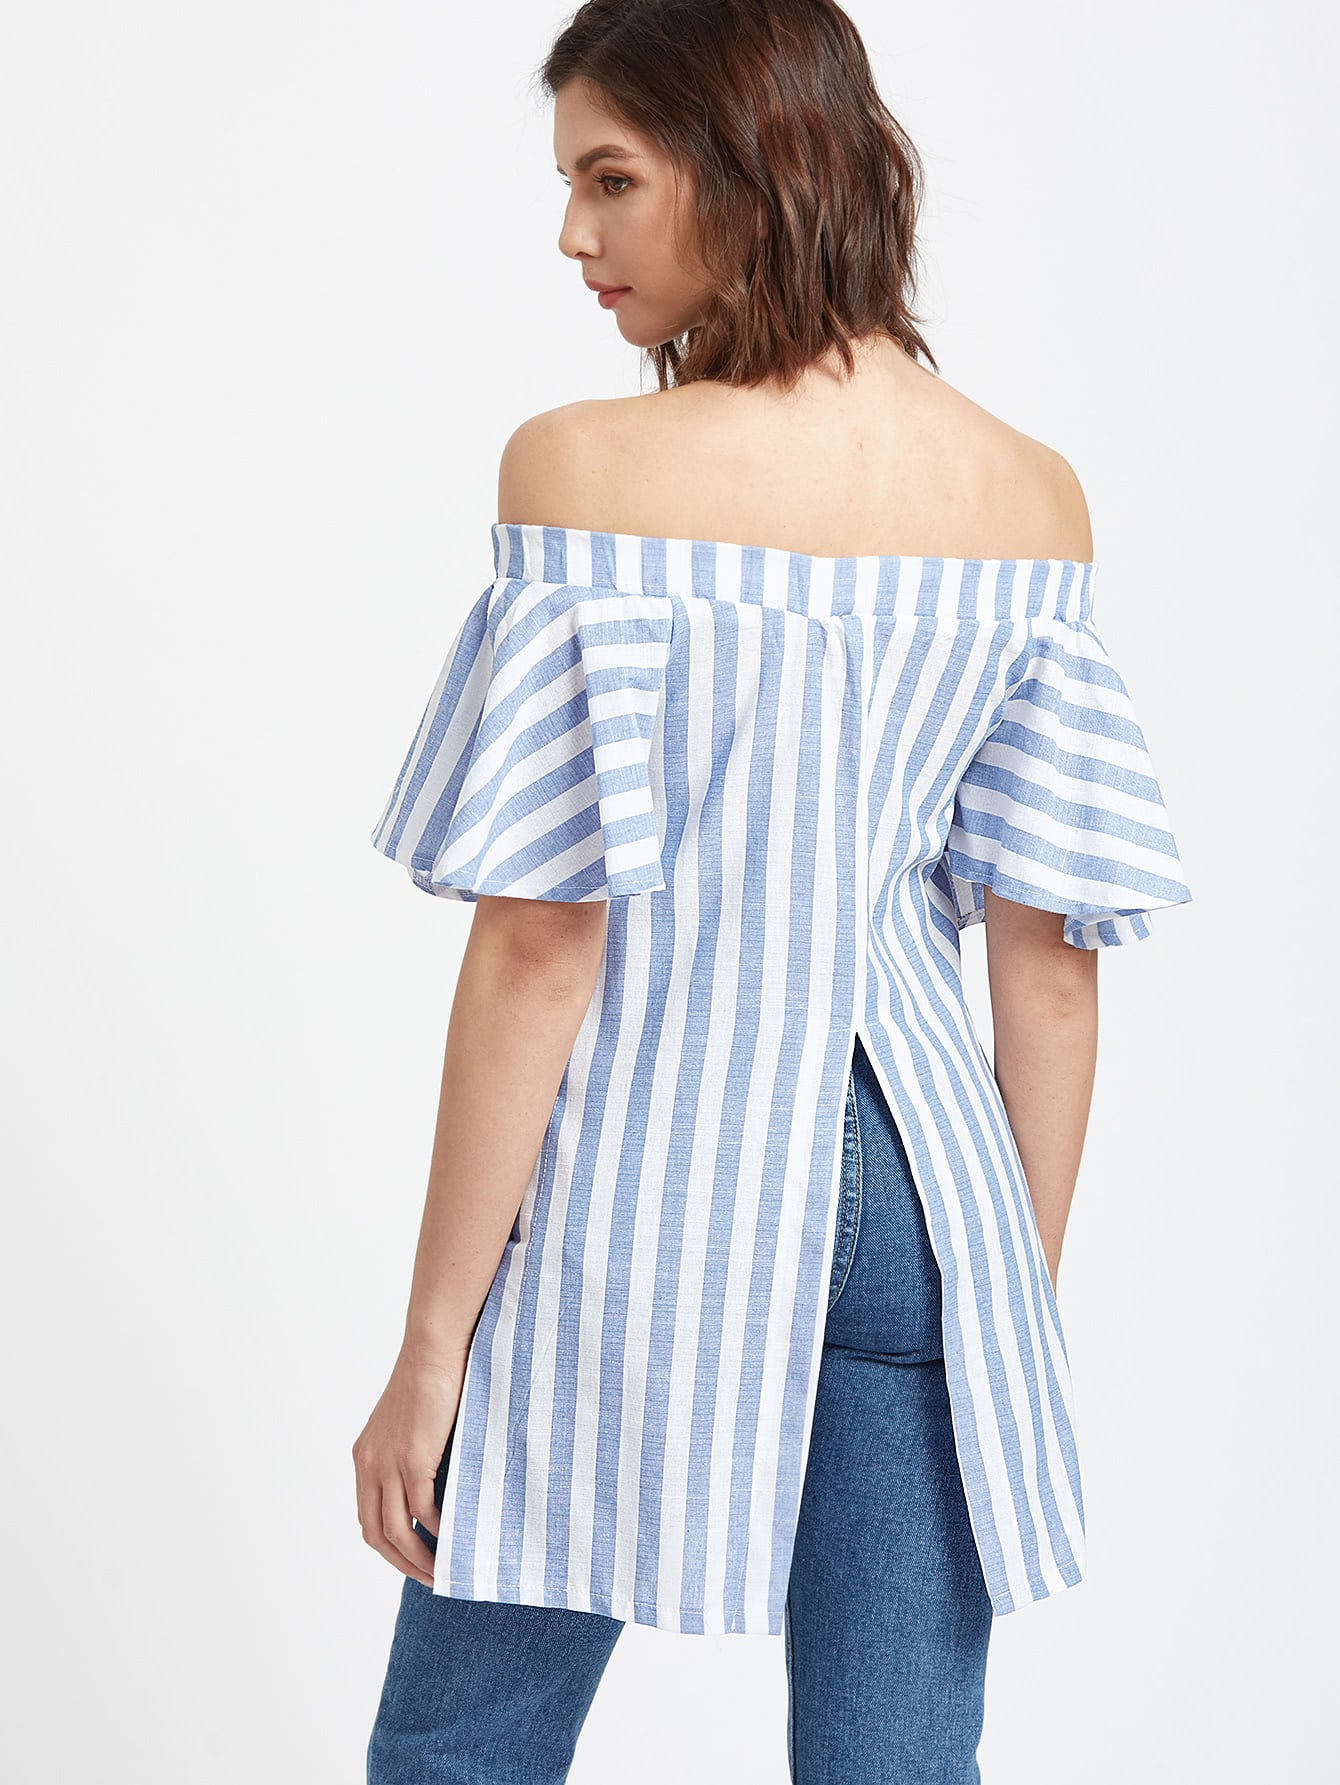 blouse170309002_2